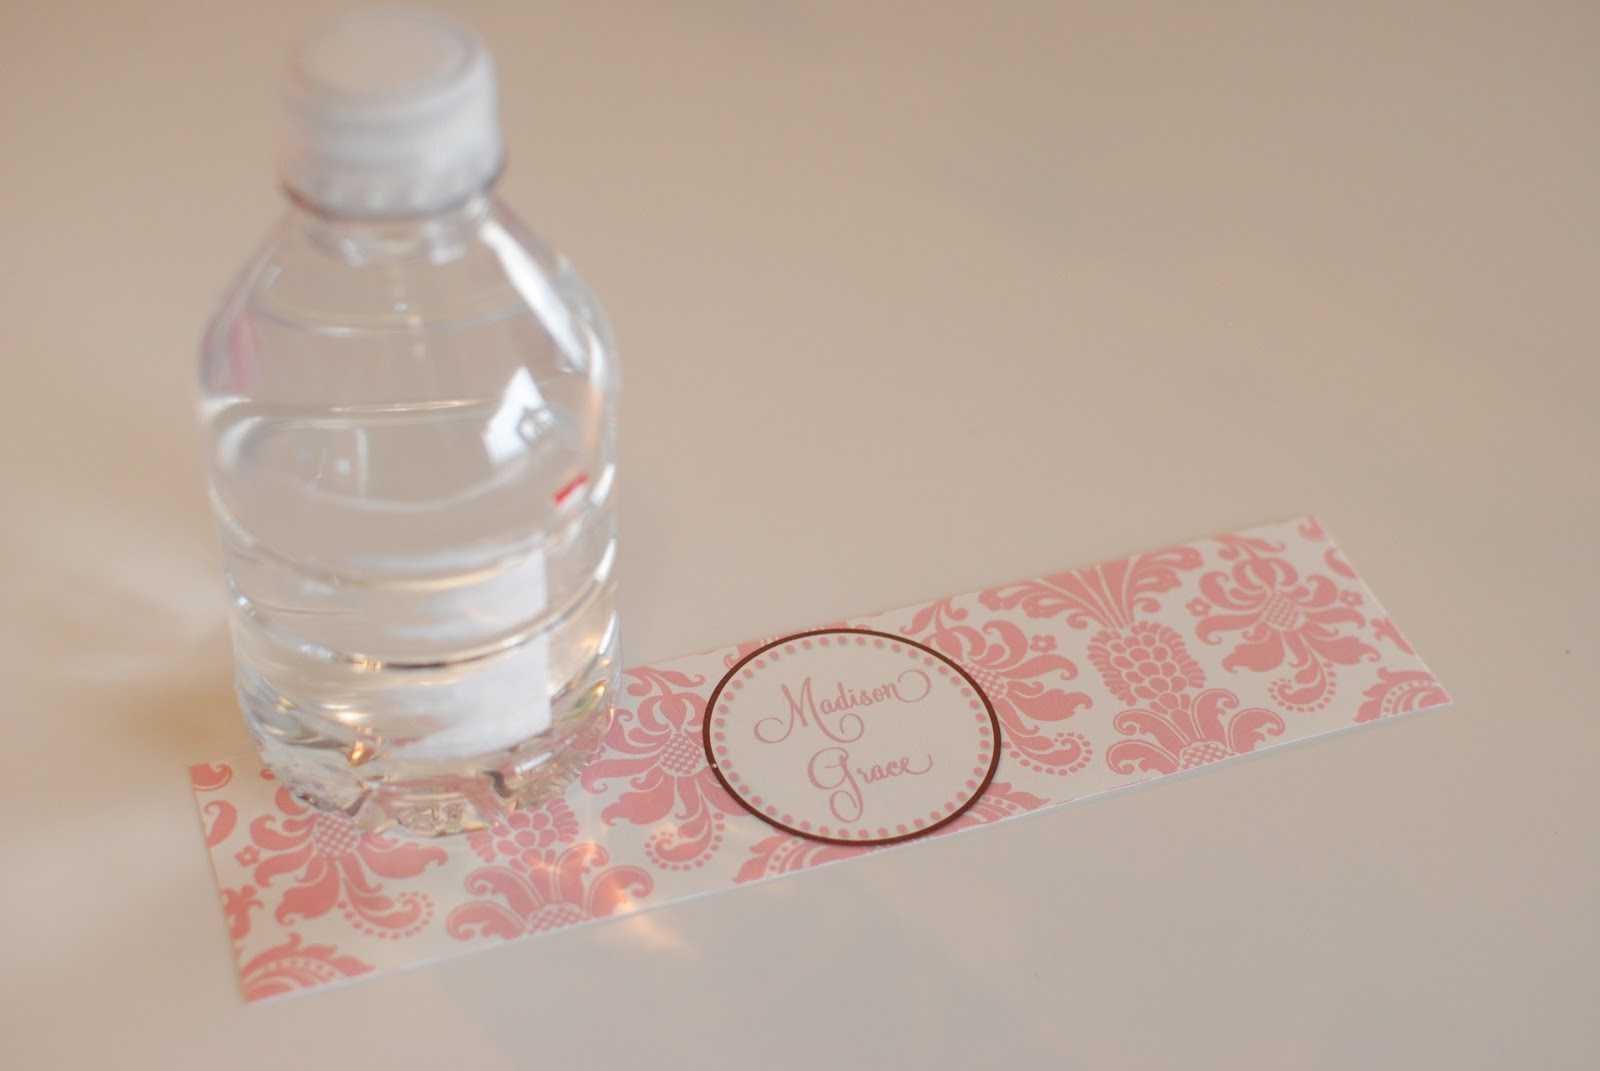 035 Waterbottlelabel1 Template Ideas Printable Water Bottle Inside Free Printable Water Bottle Label Template